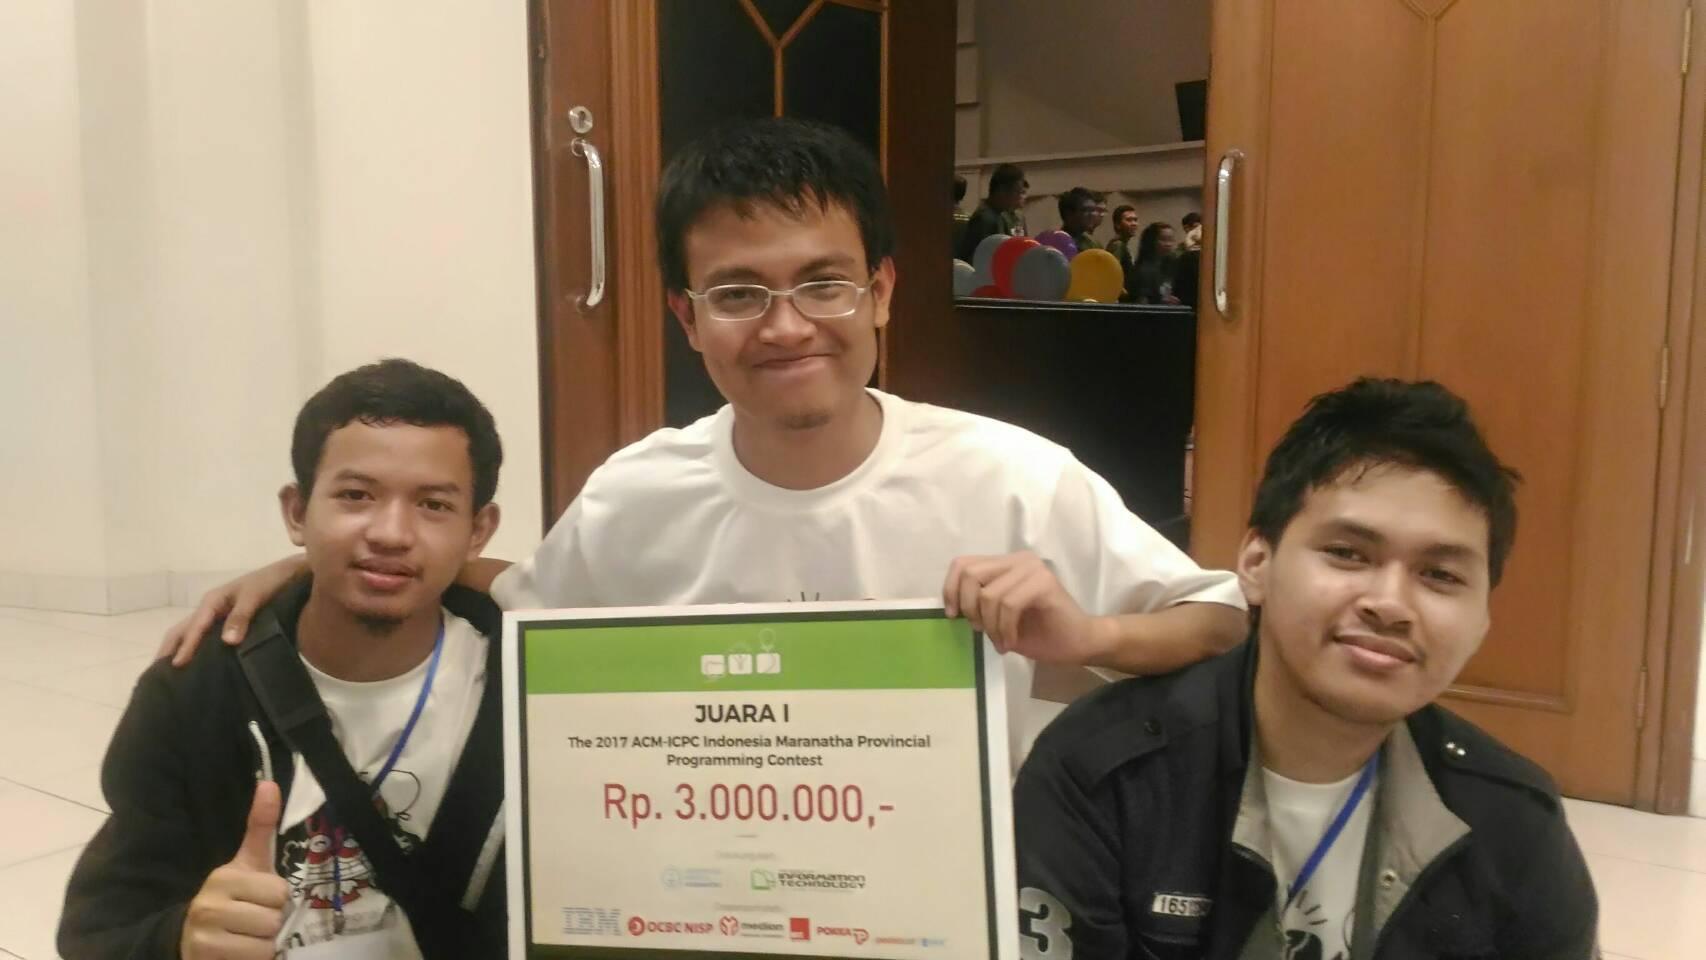 Dua Tim ITB Memenangkan 2017 ACM-ICPC Indonesia Maranatha